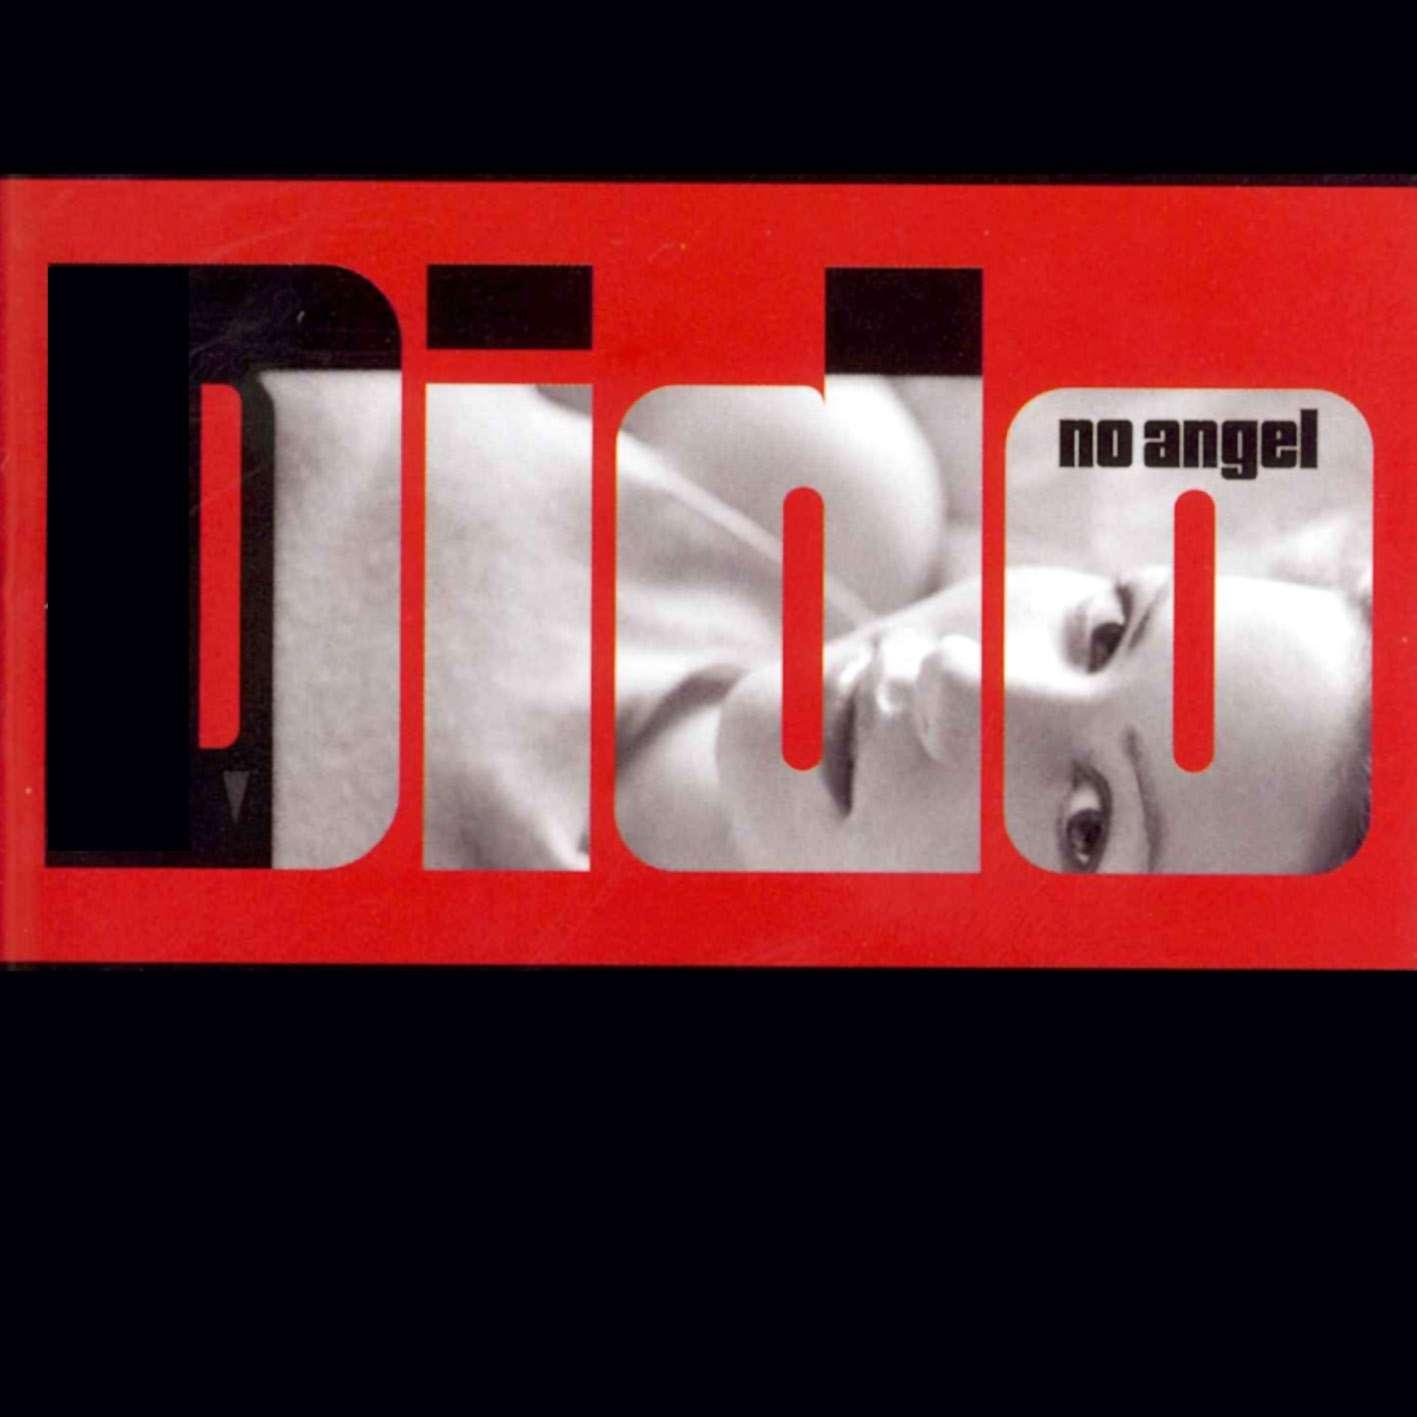 http://4.bp.blogspot.com/-dZ_QJ4r7Ytc/Tvxb01aXwLI/AAAAAAAAFGQ/1nQmtkKCfxw/s1600/Dido-No-Angel-Delantera.jpg